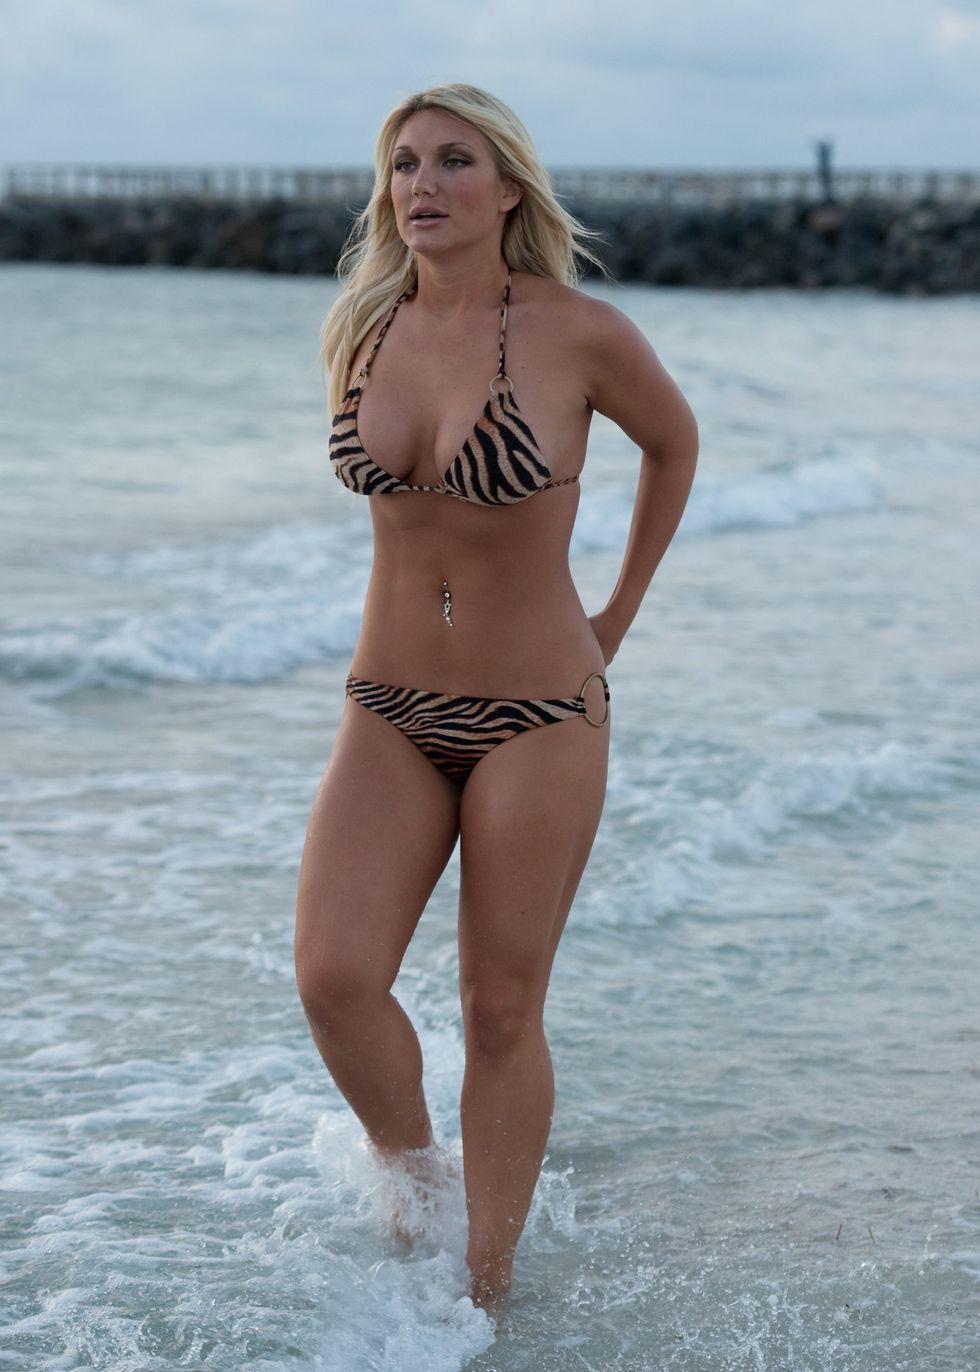 brooke hogan in bikini for a shoot in miami beach 03 | GotCeleb